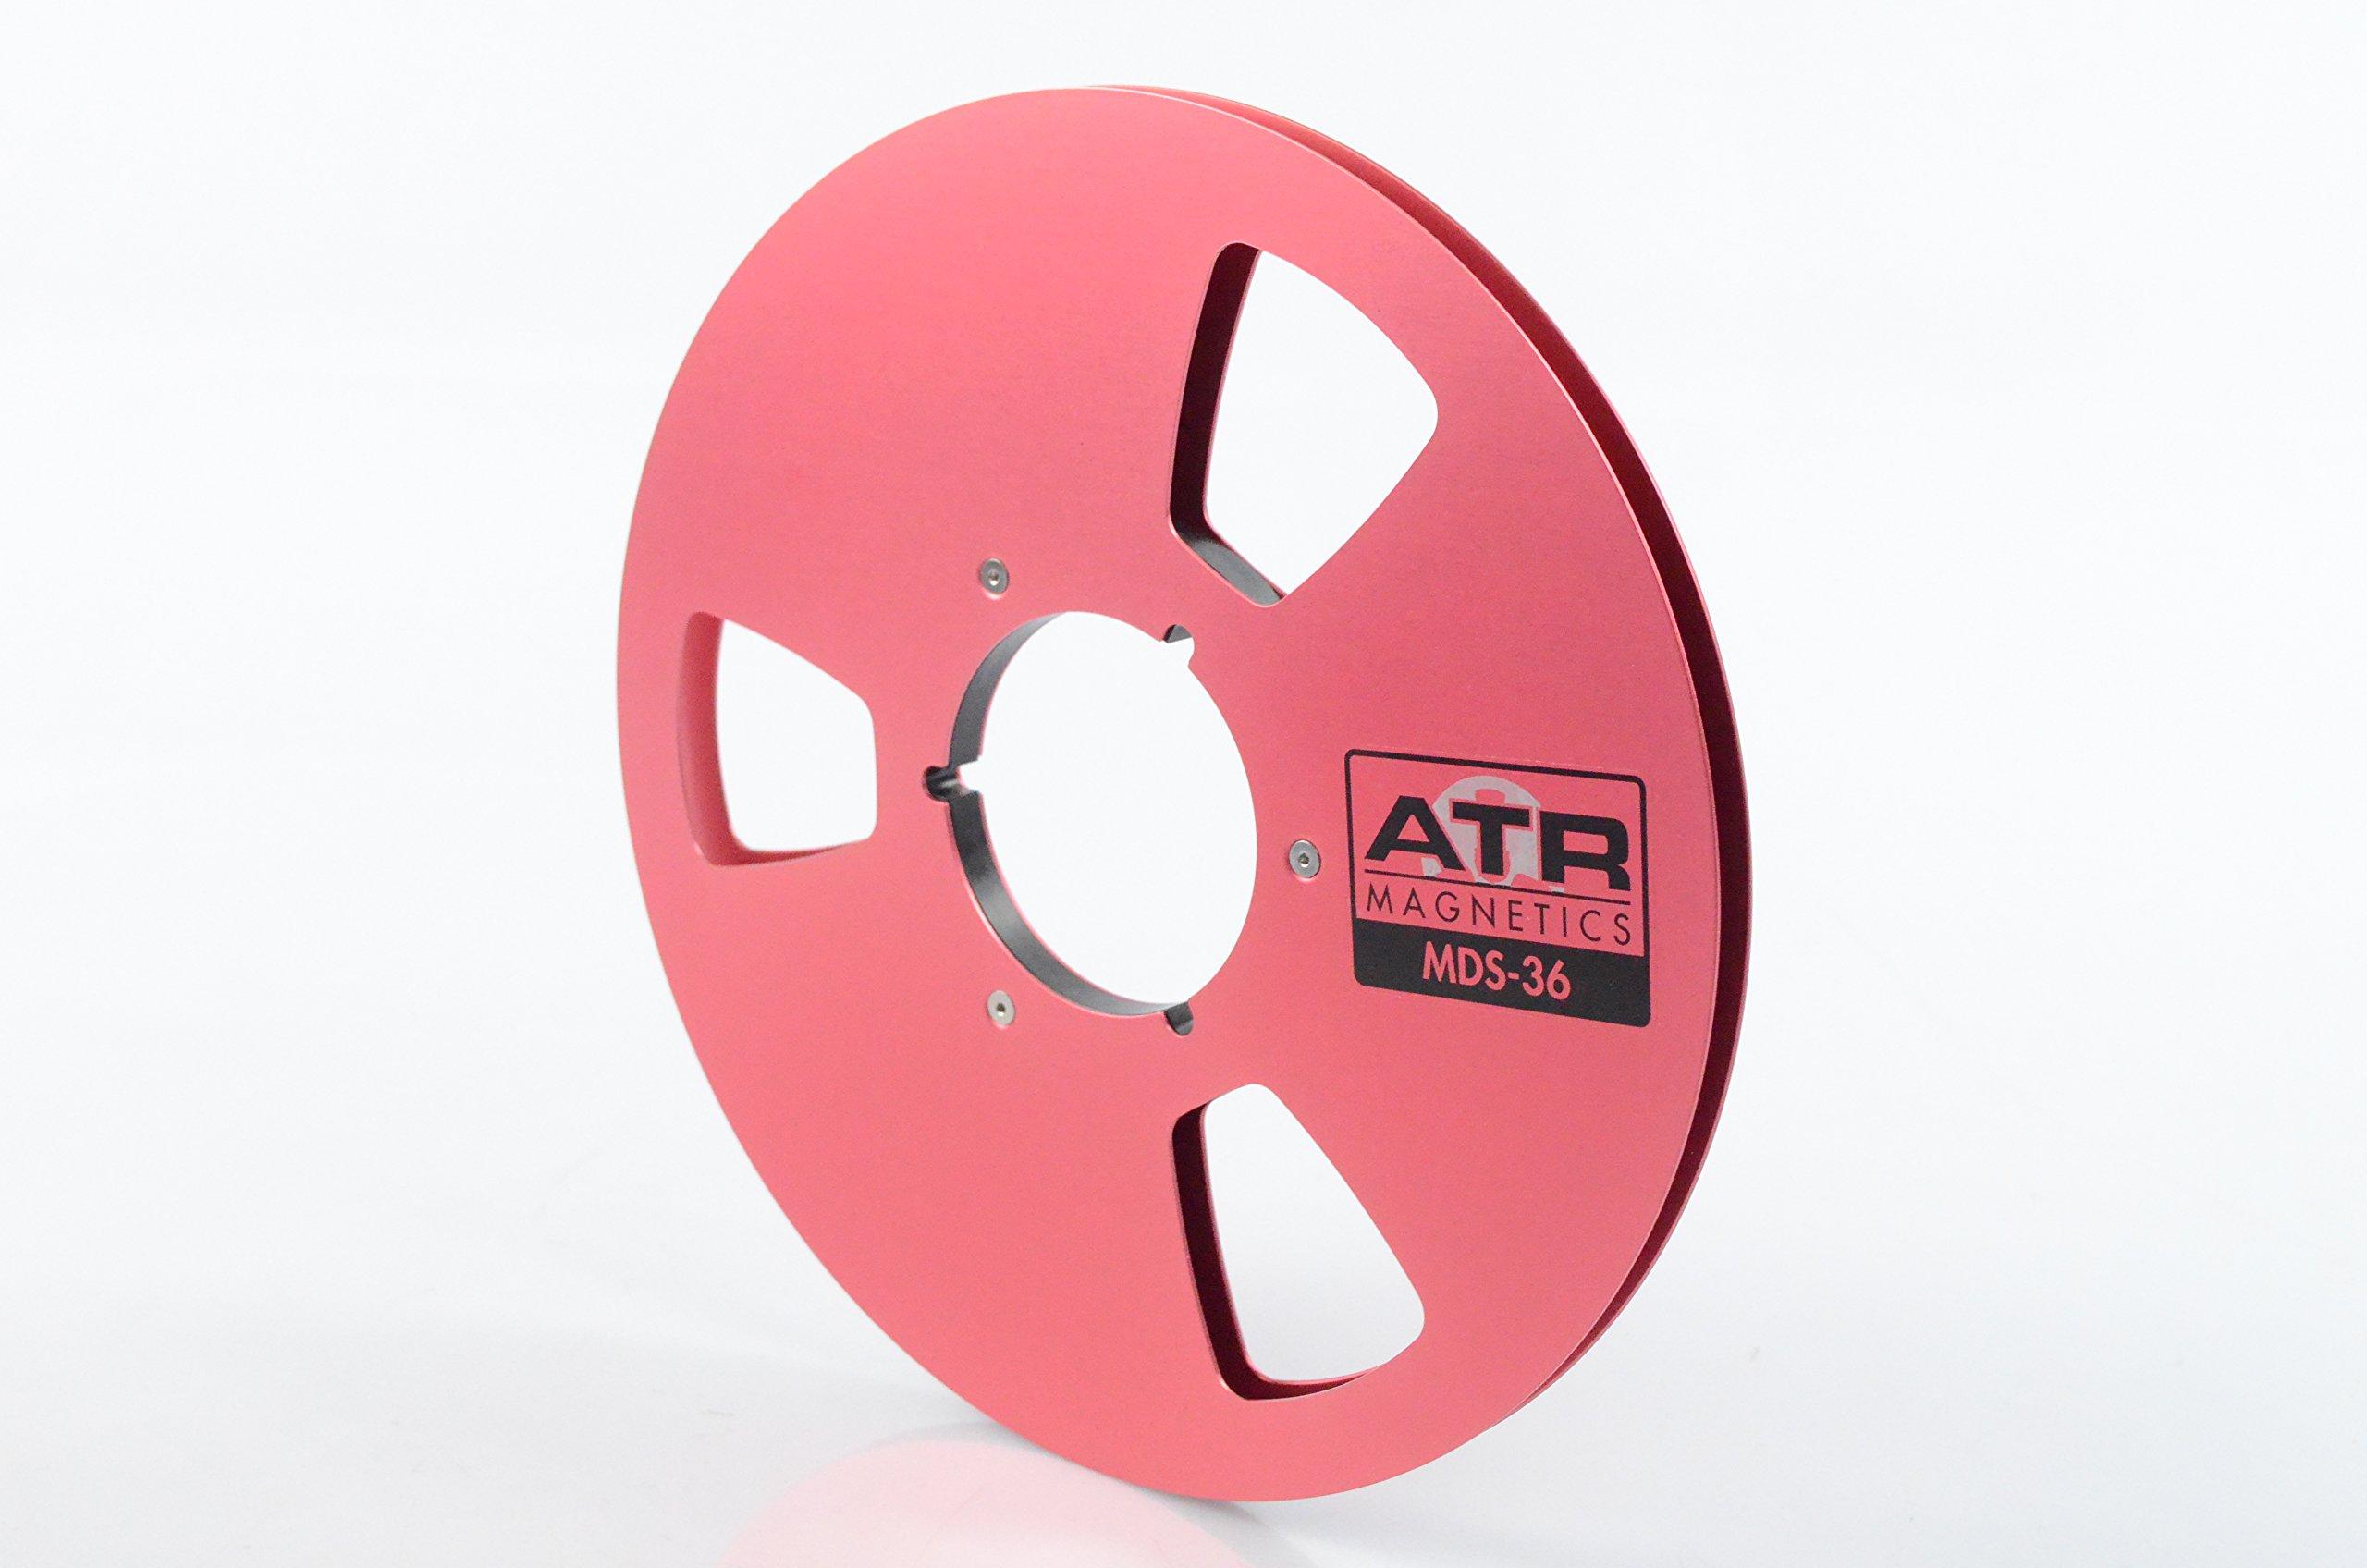 ATR Magnetics 1/4'' MDS-36 | 10.5'' Reel | Empty